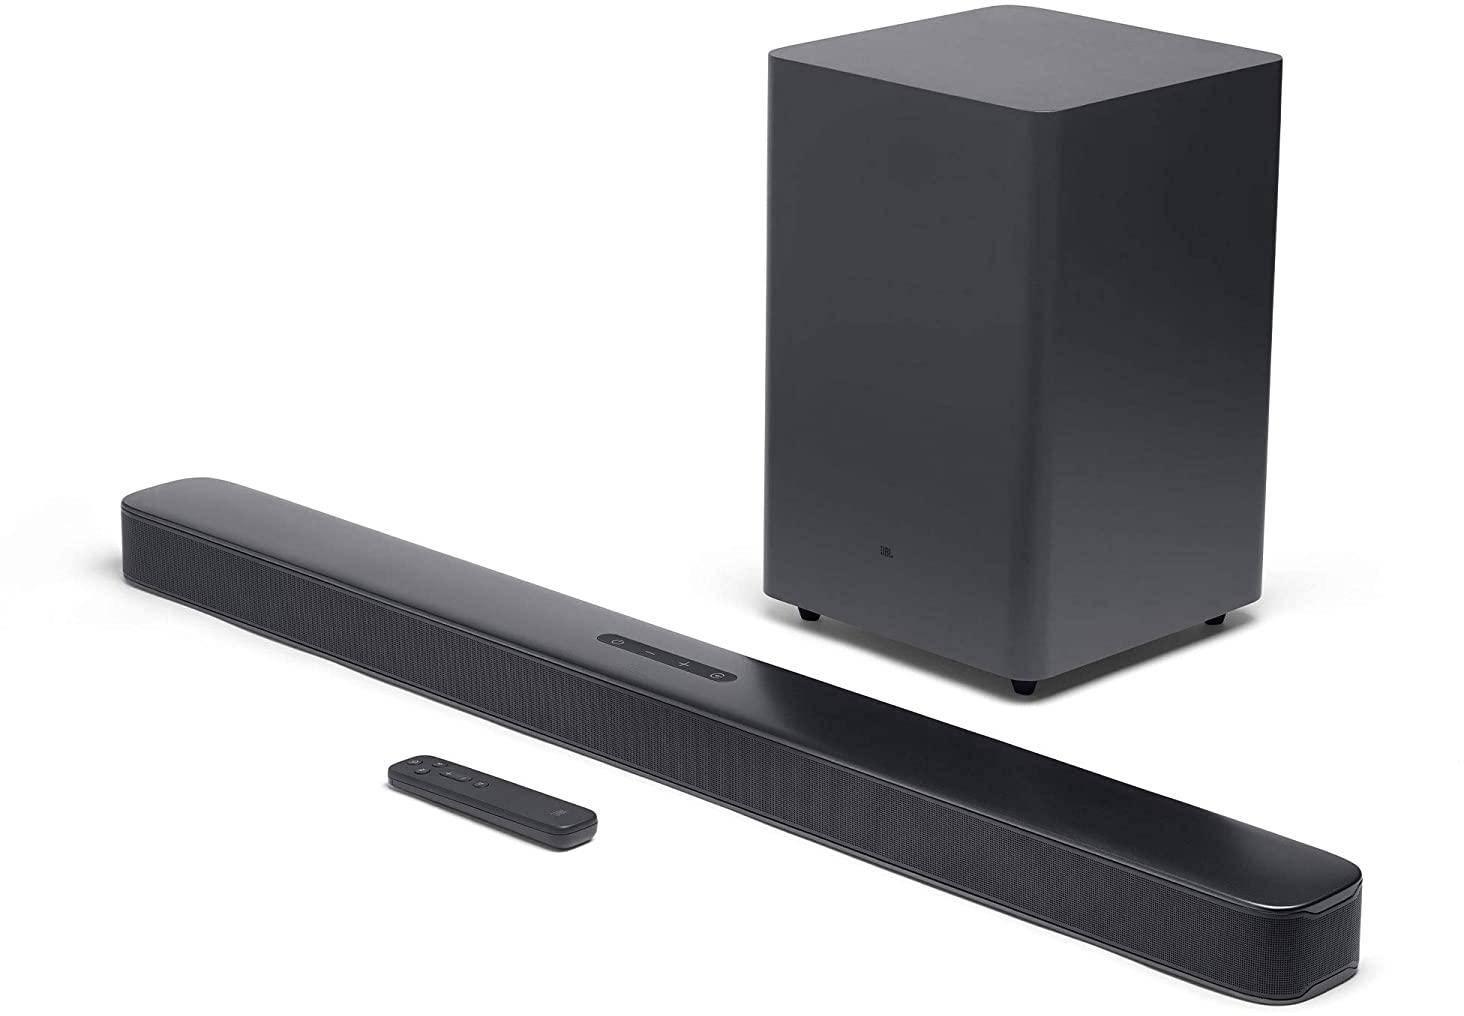 JBL Bar 2.1 Deep Bass Soundbar with Dolby Digital Wireless Subwoofer (300 Watts) zoom image